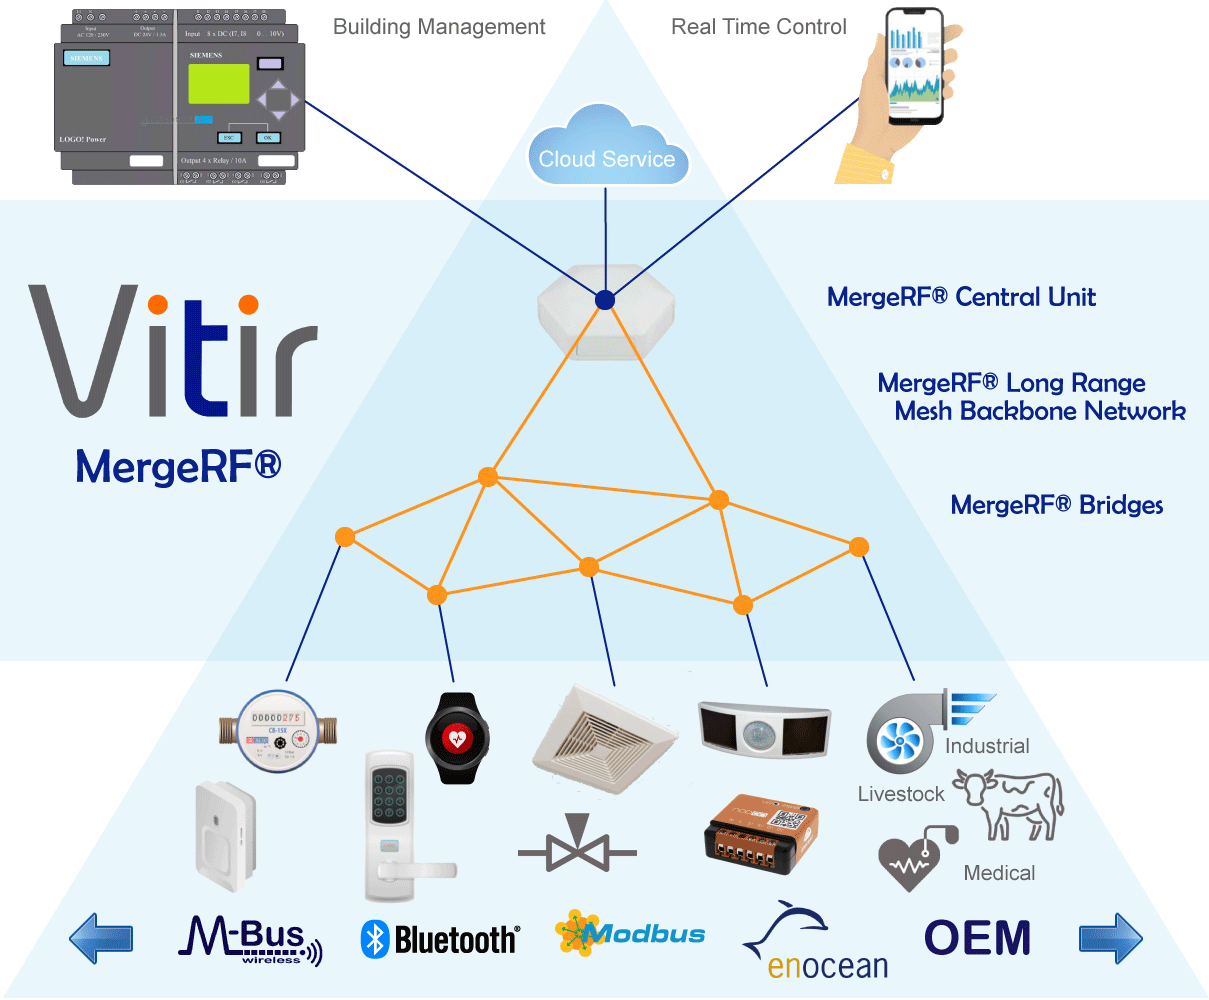 Vitir MergeRF® Technology